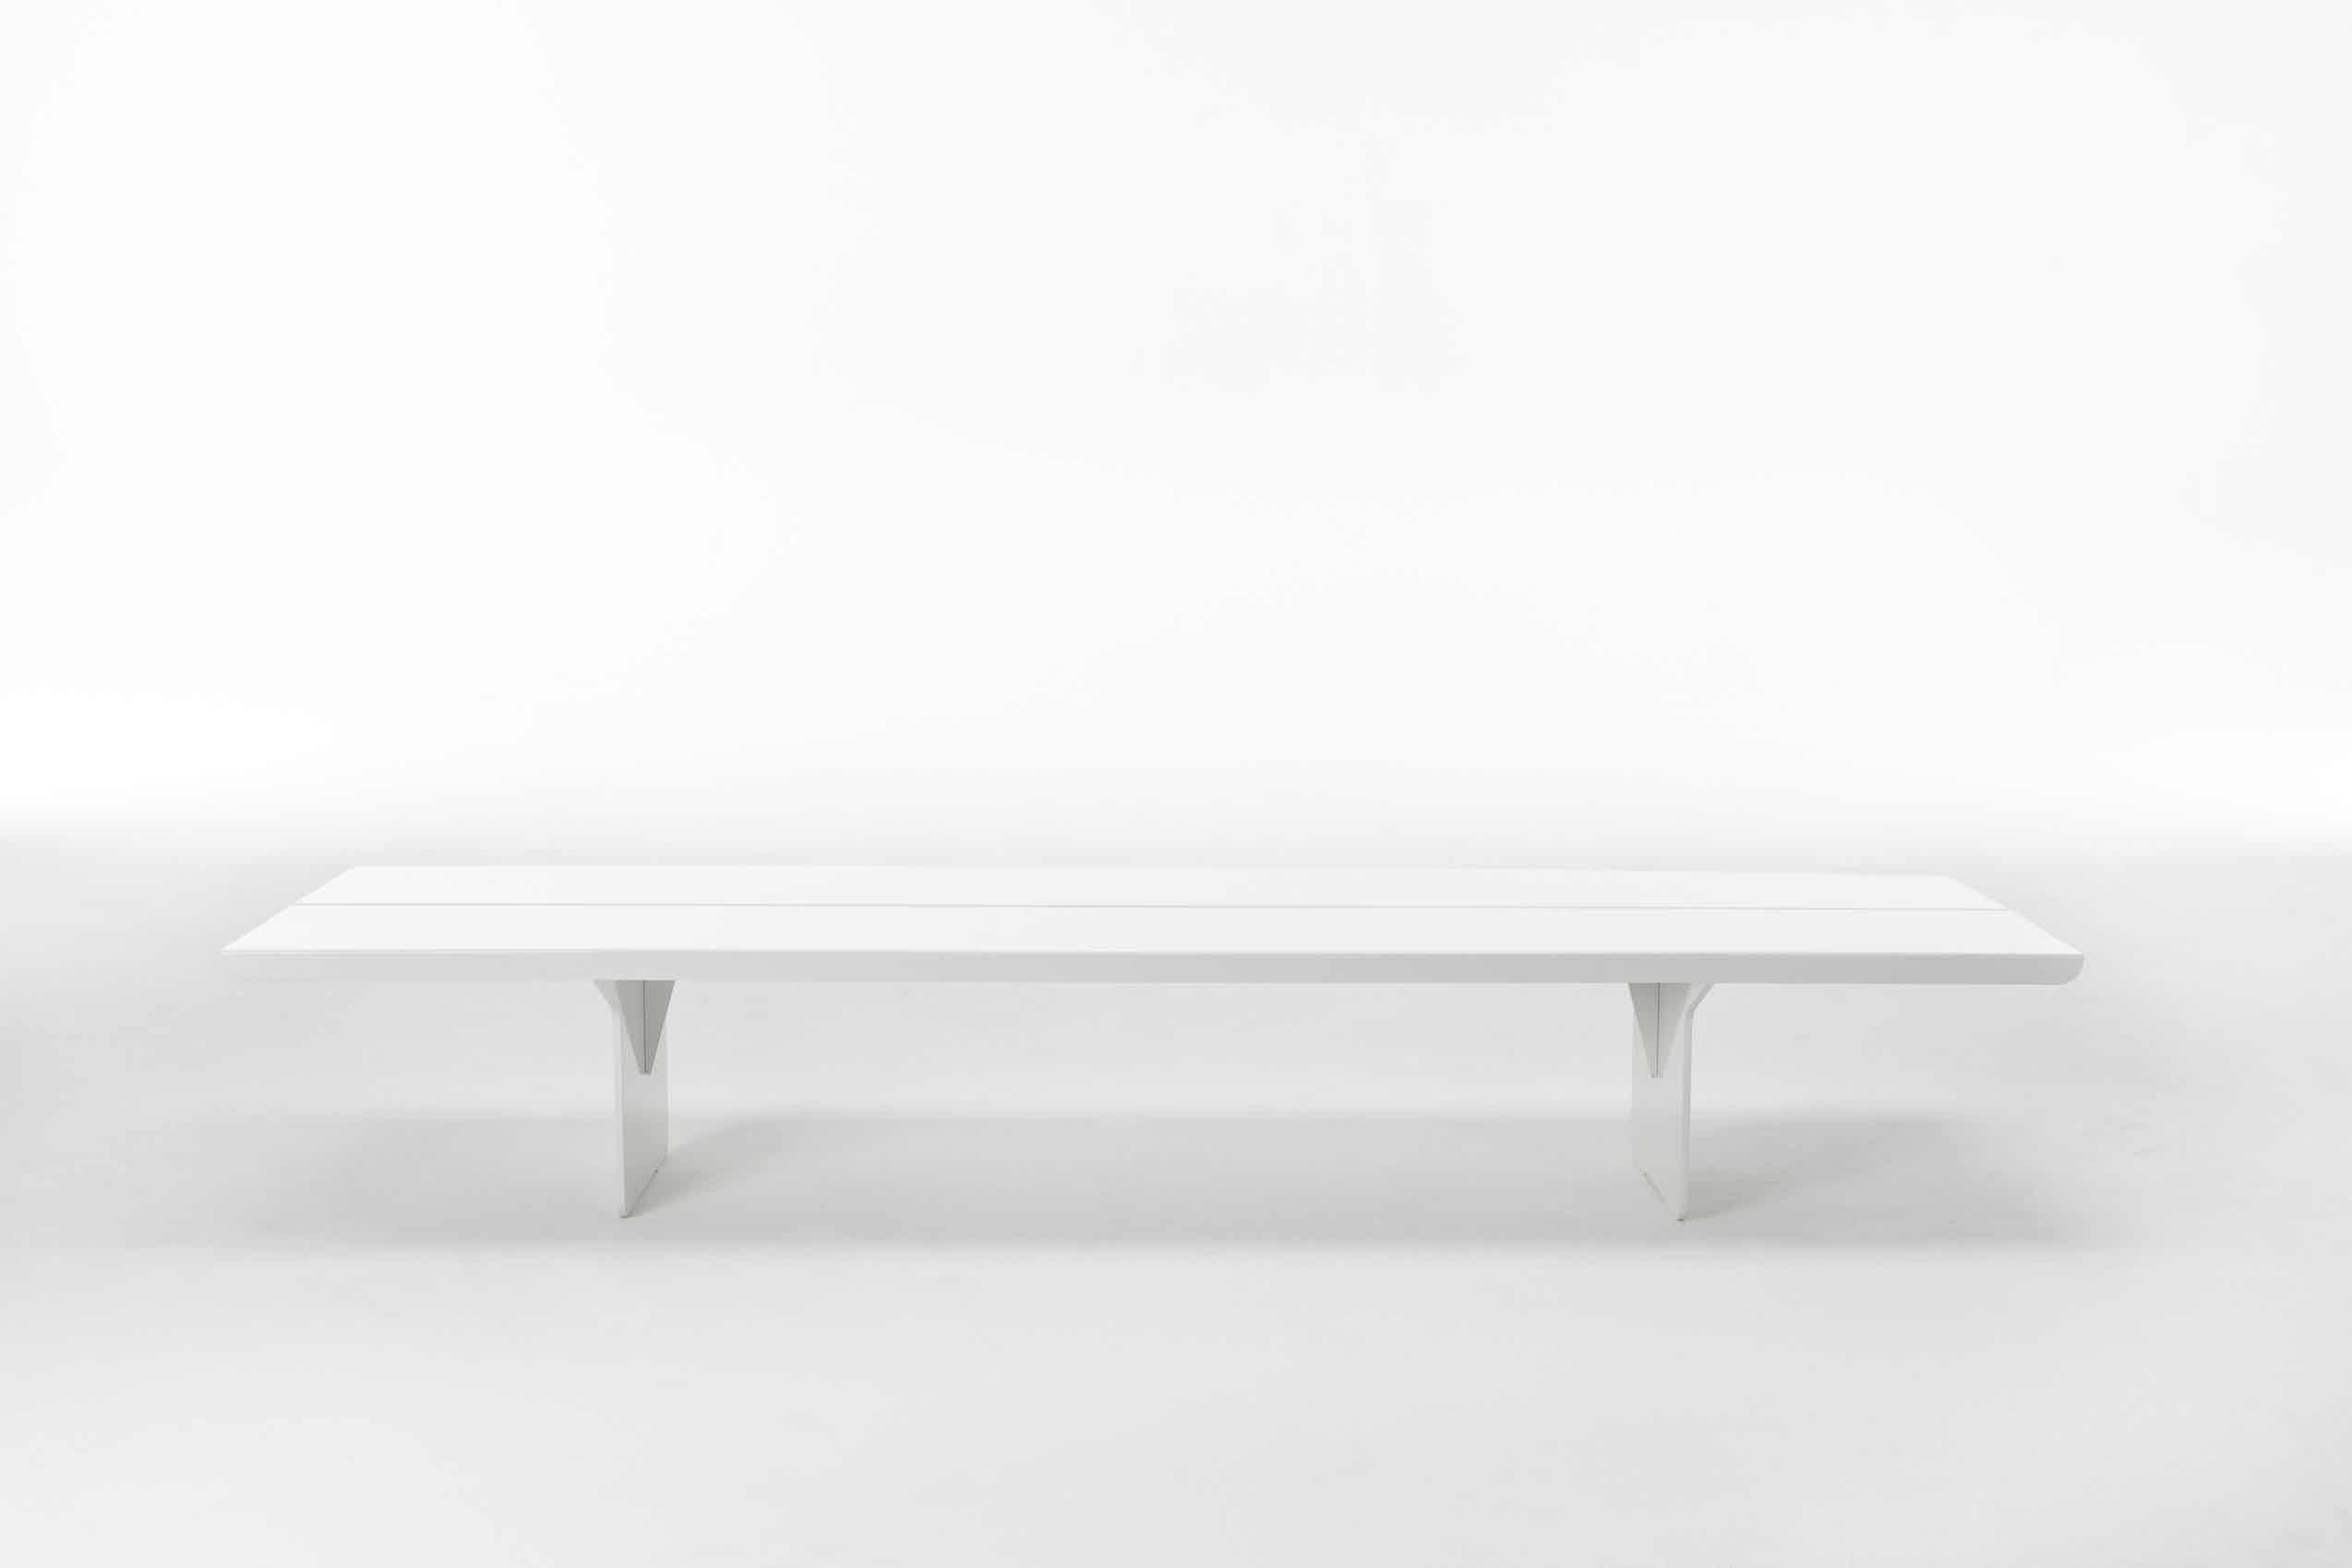 Resident-furniture-flyover-table-long-front-haute-living